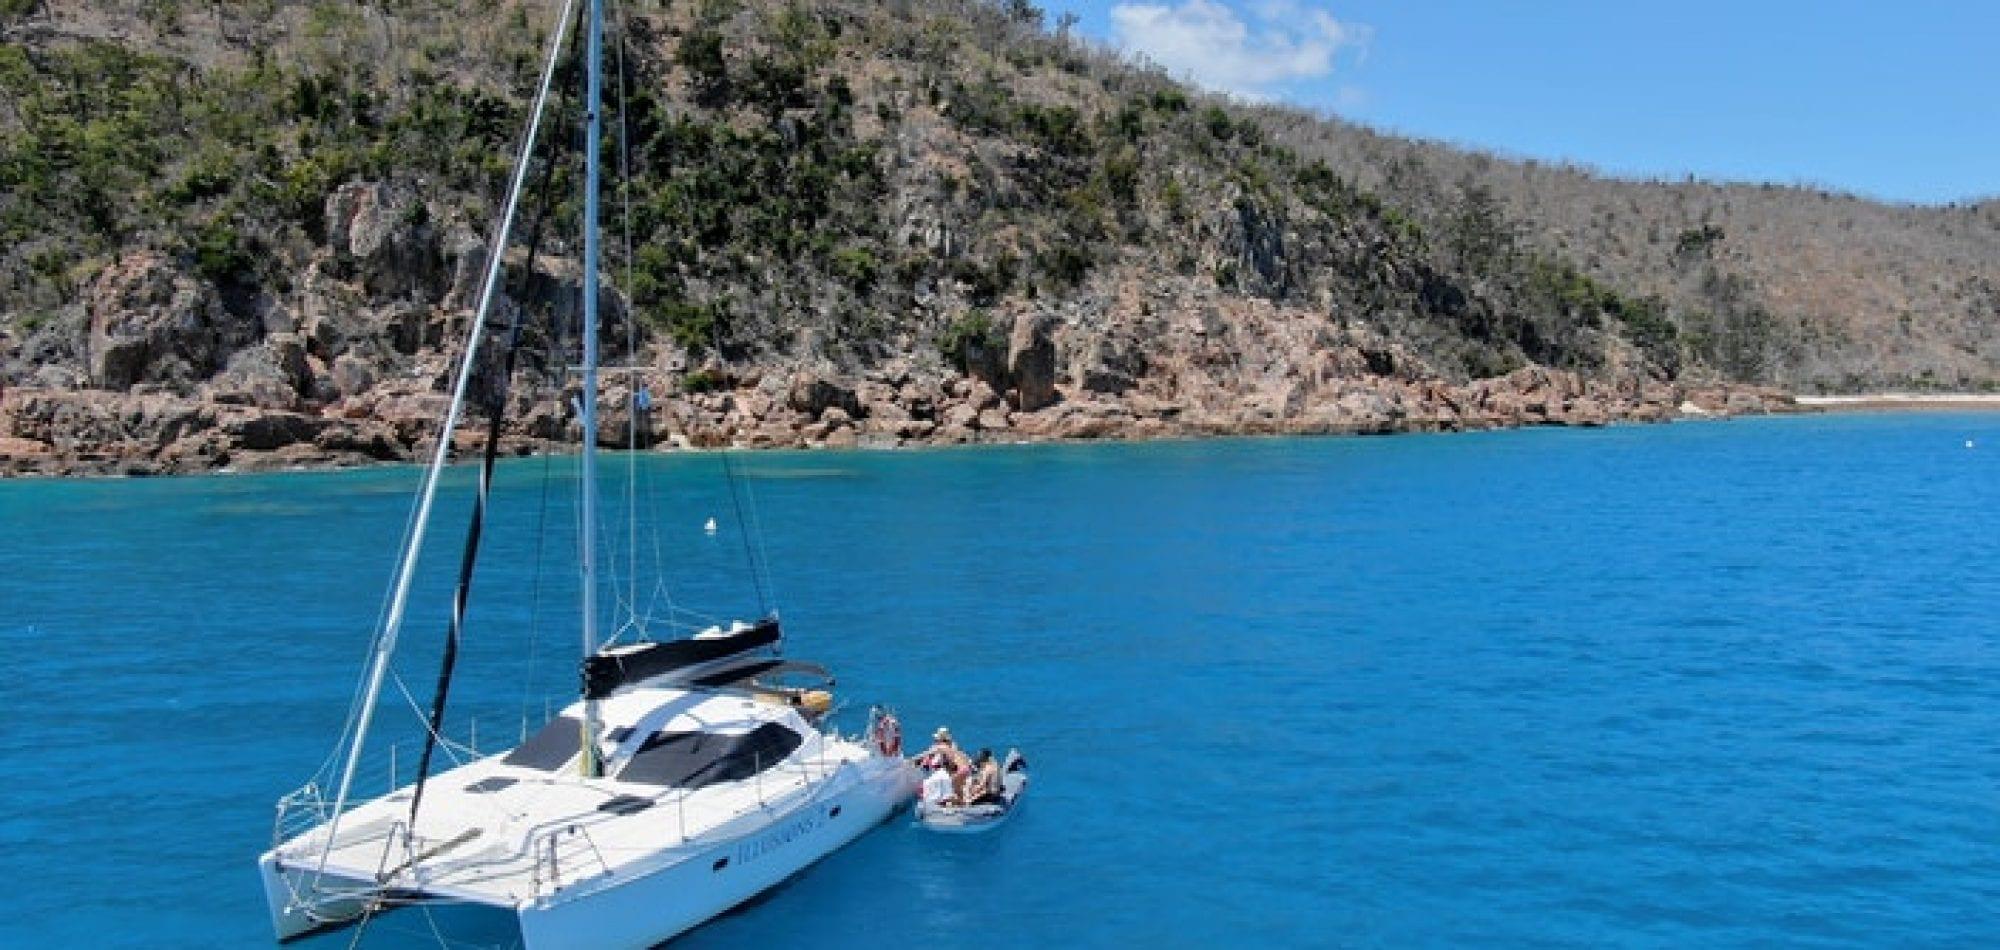 Illusions - Sailing Whitsunday Islands